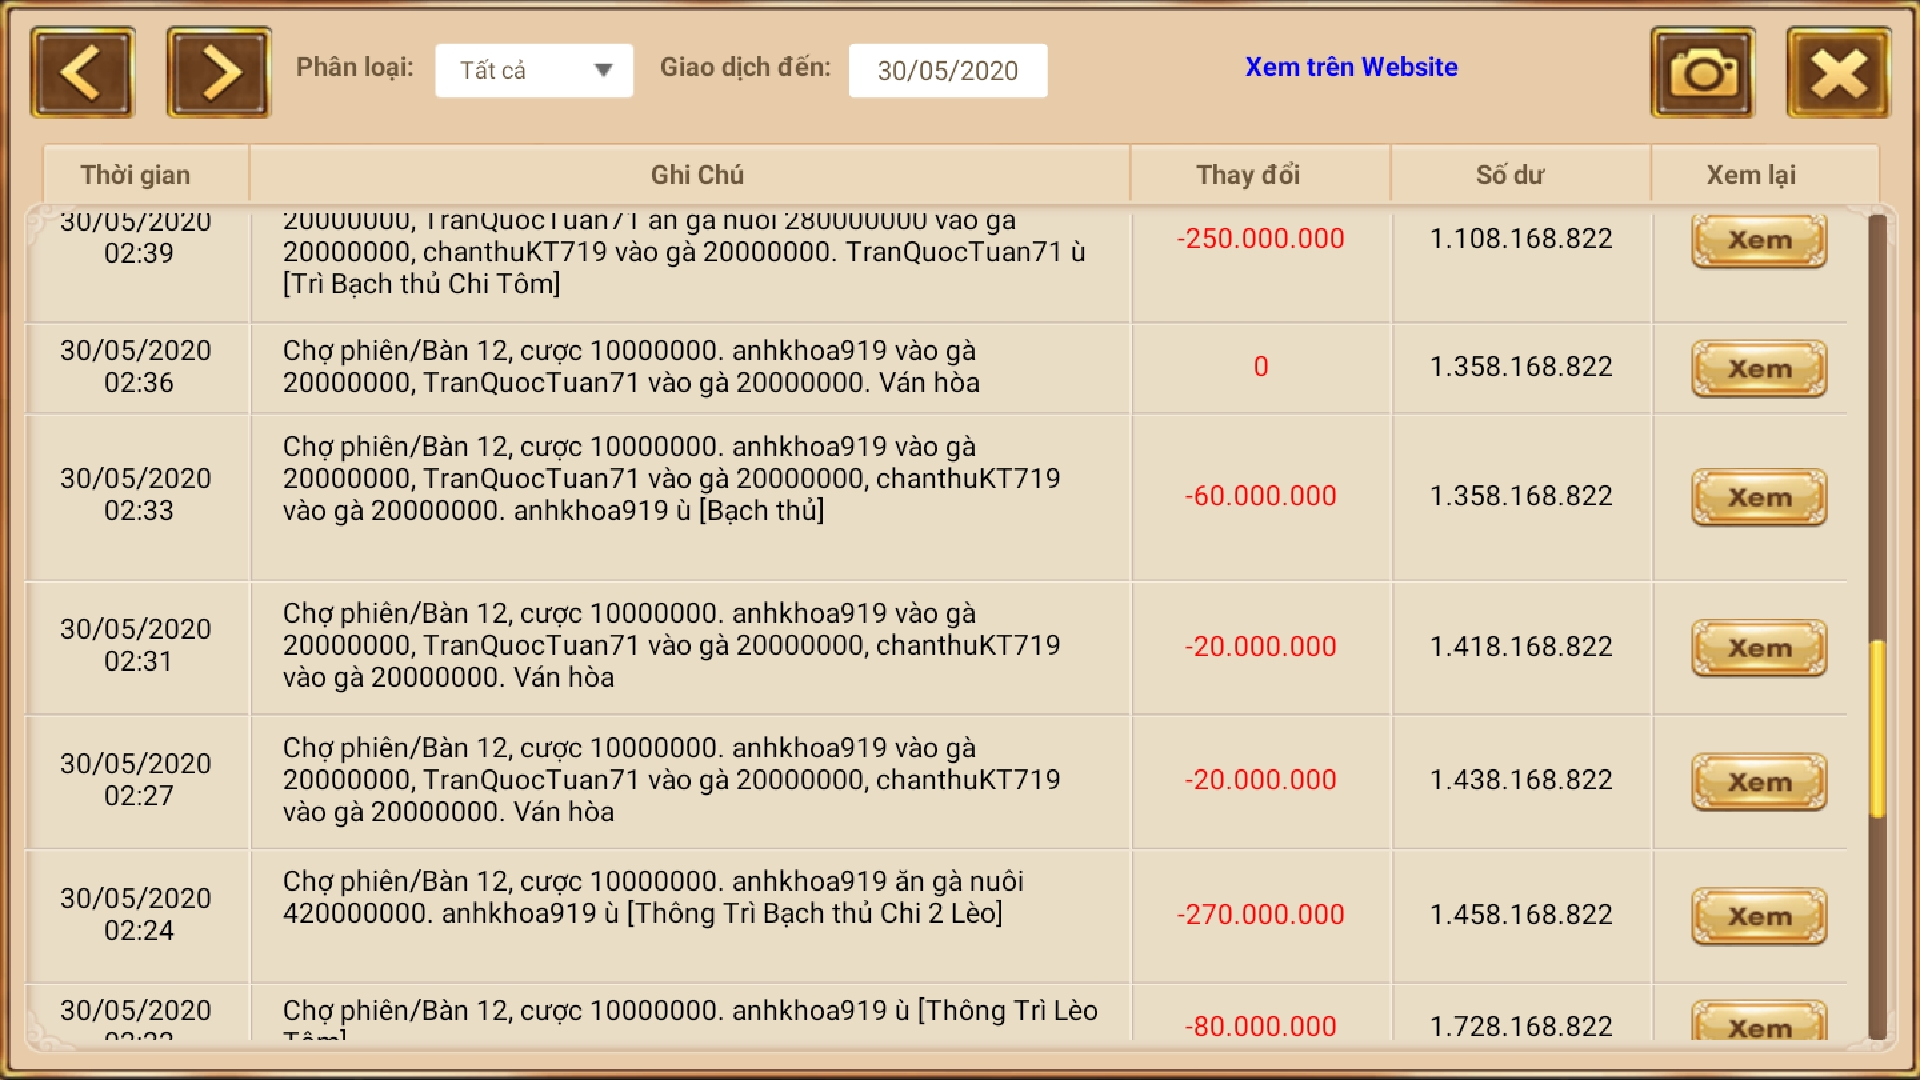 Screenshot_20200604-105528_Chn Sn nh.